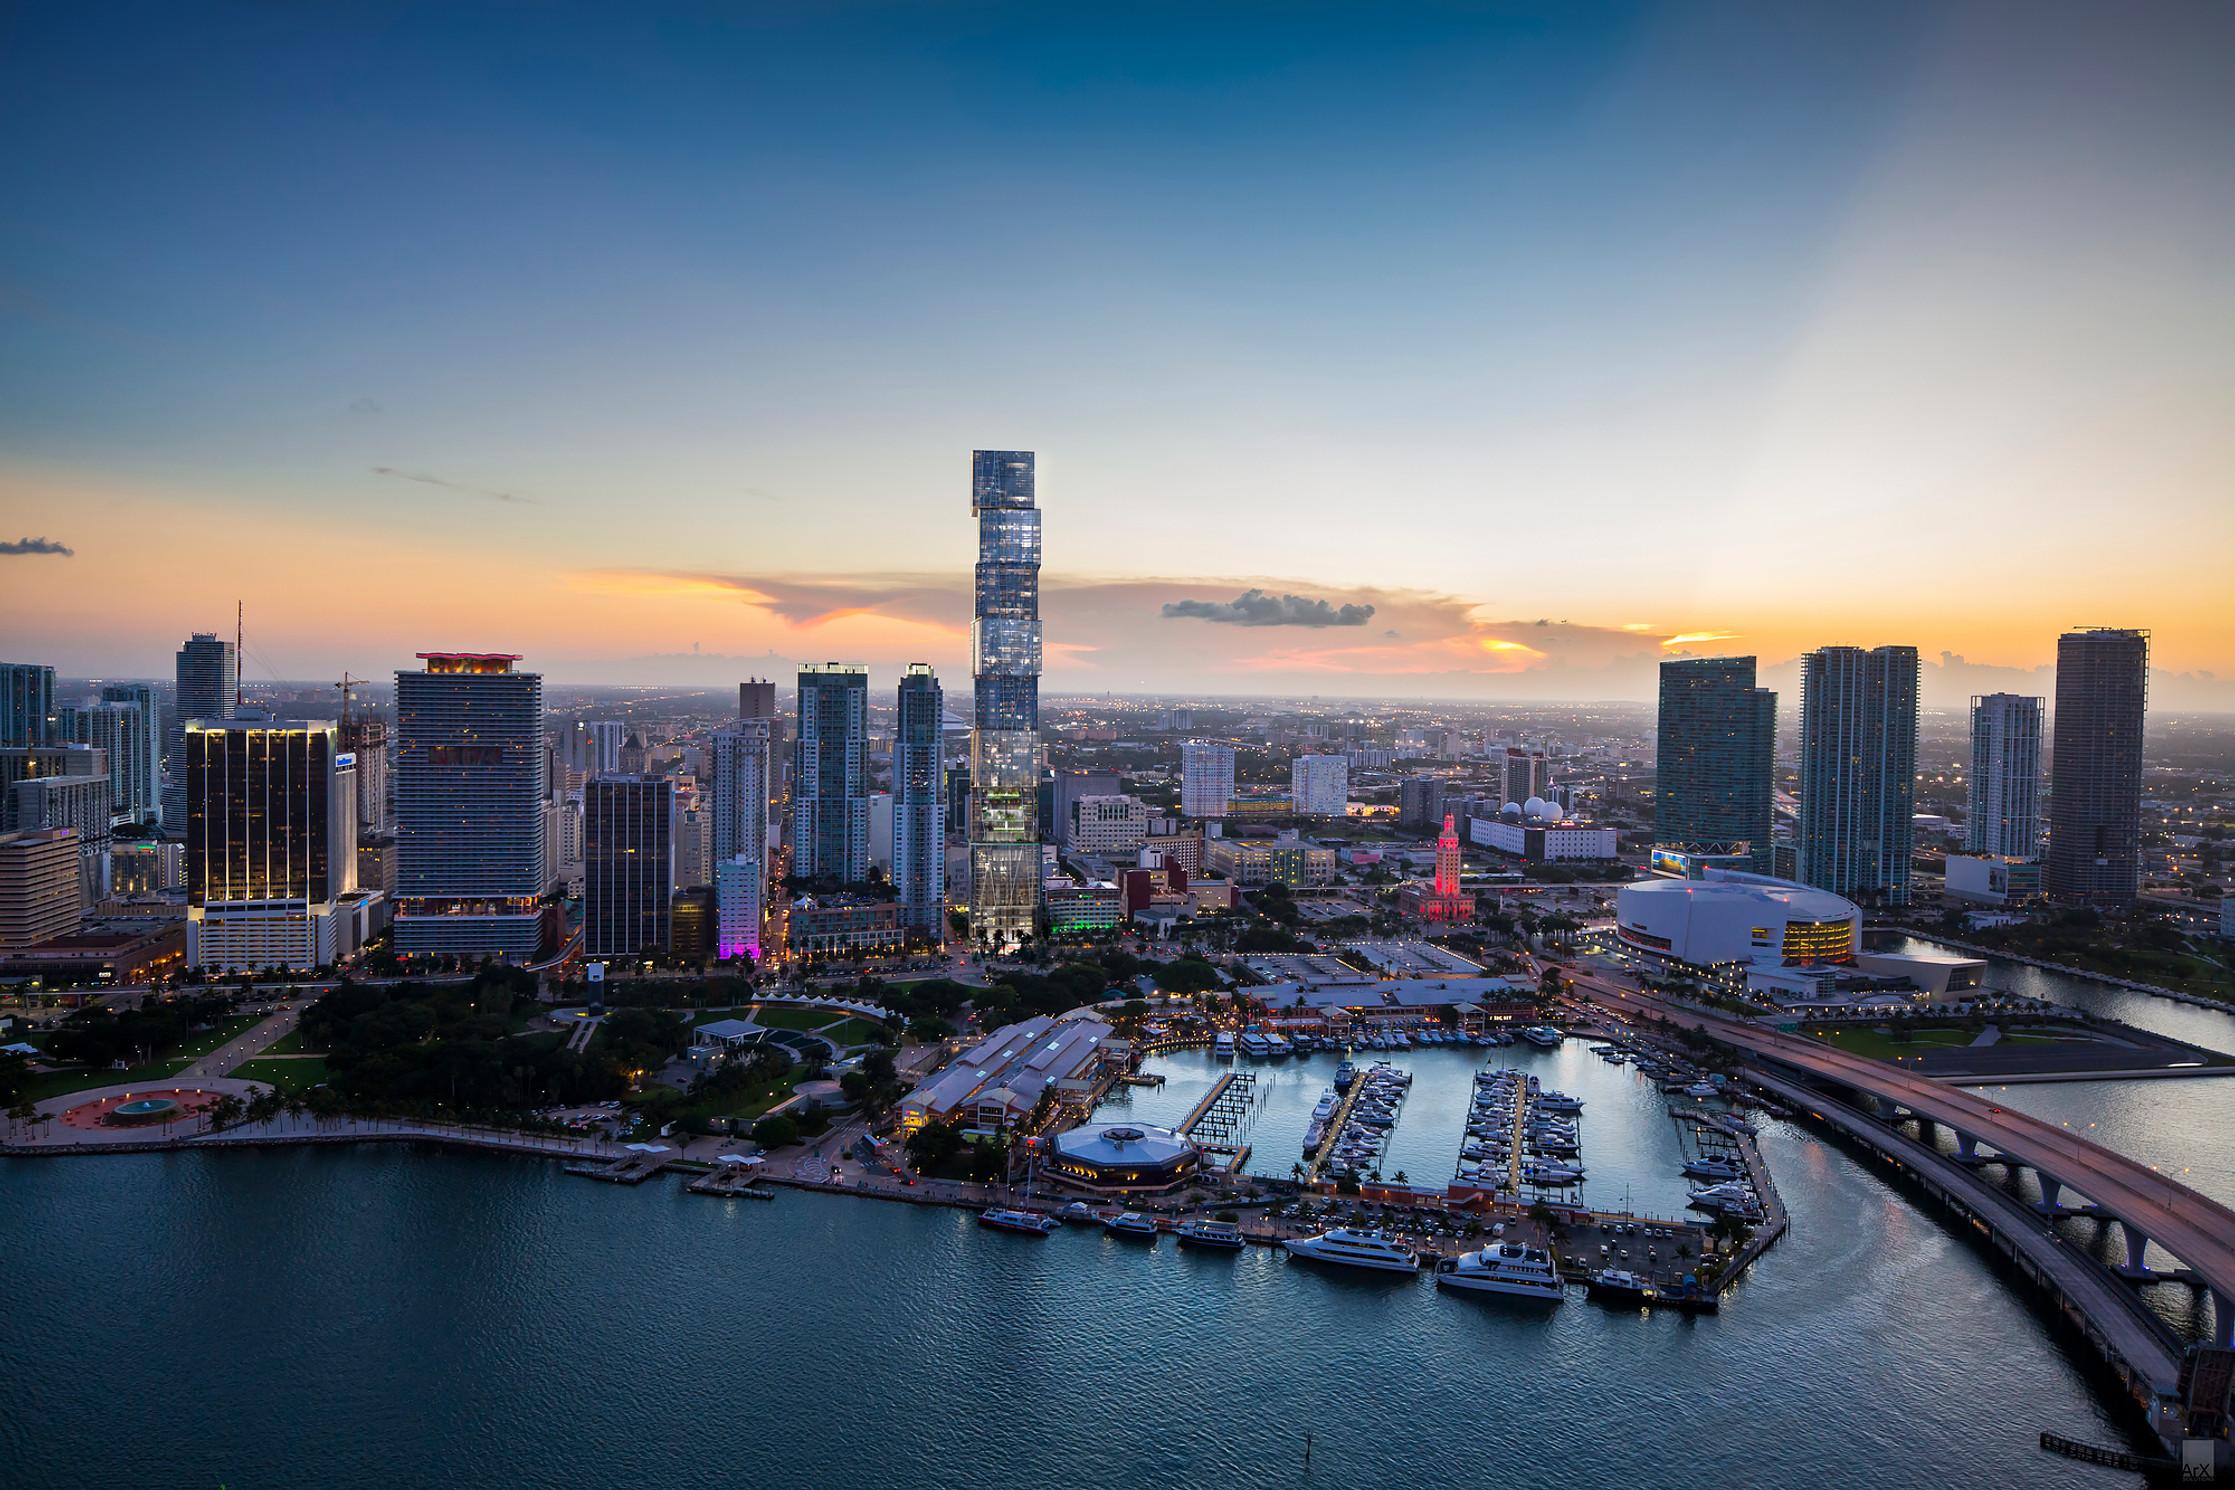 Waldorf Astoria Miami. Rendering courtesy of ArX Solutions USA LLC.